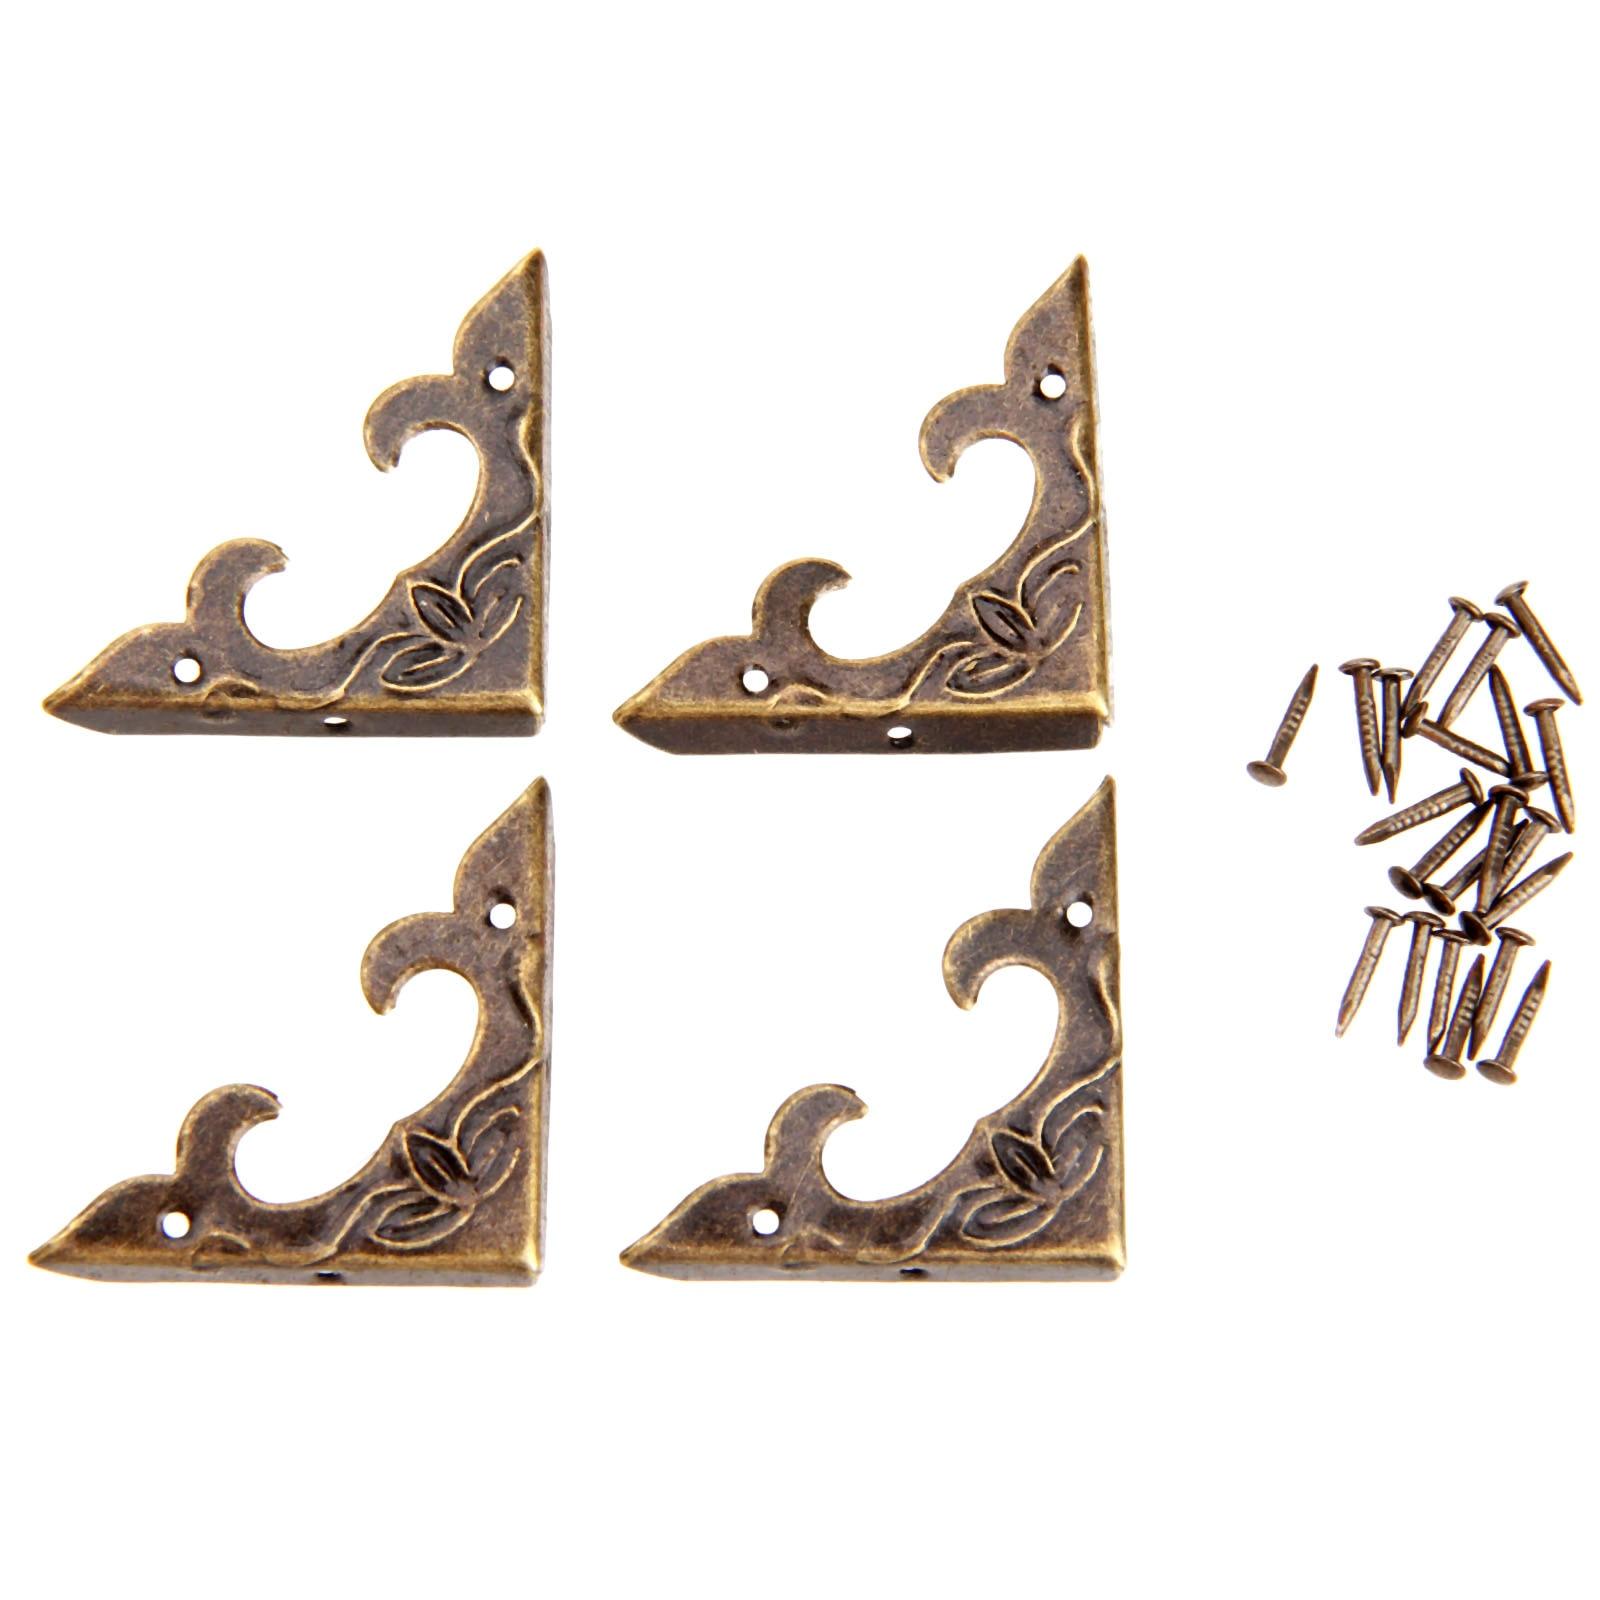 20pc-antique-brass-furniture-corner-brackets-jewelry-gift-box-wood-case-decorative-feet-leg-metal-corner-protector-for-furniture